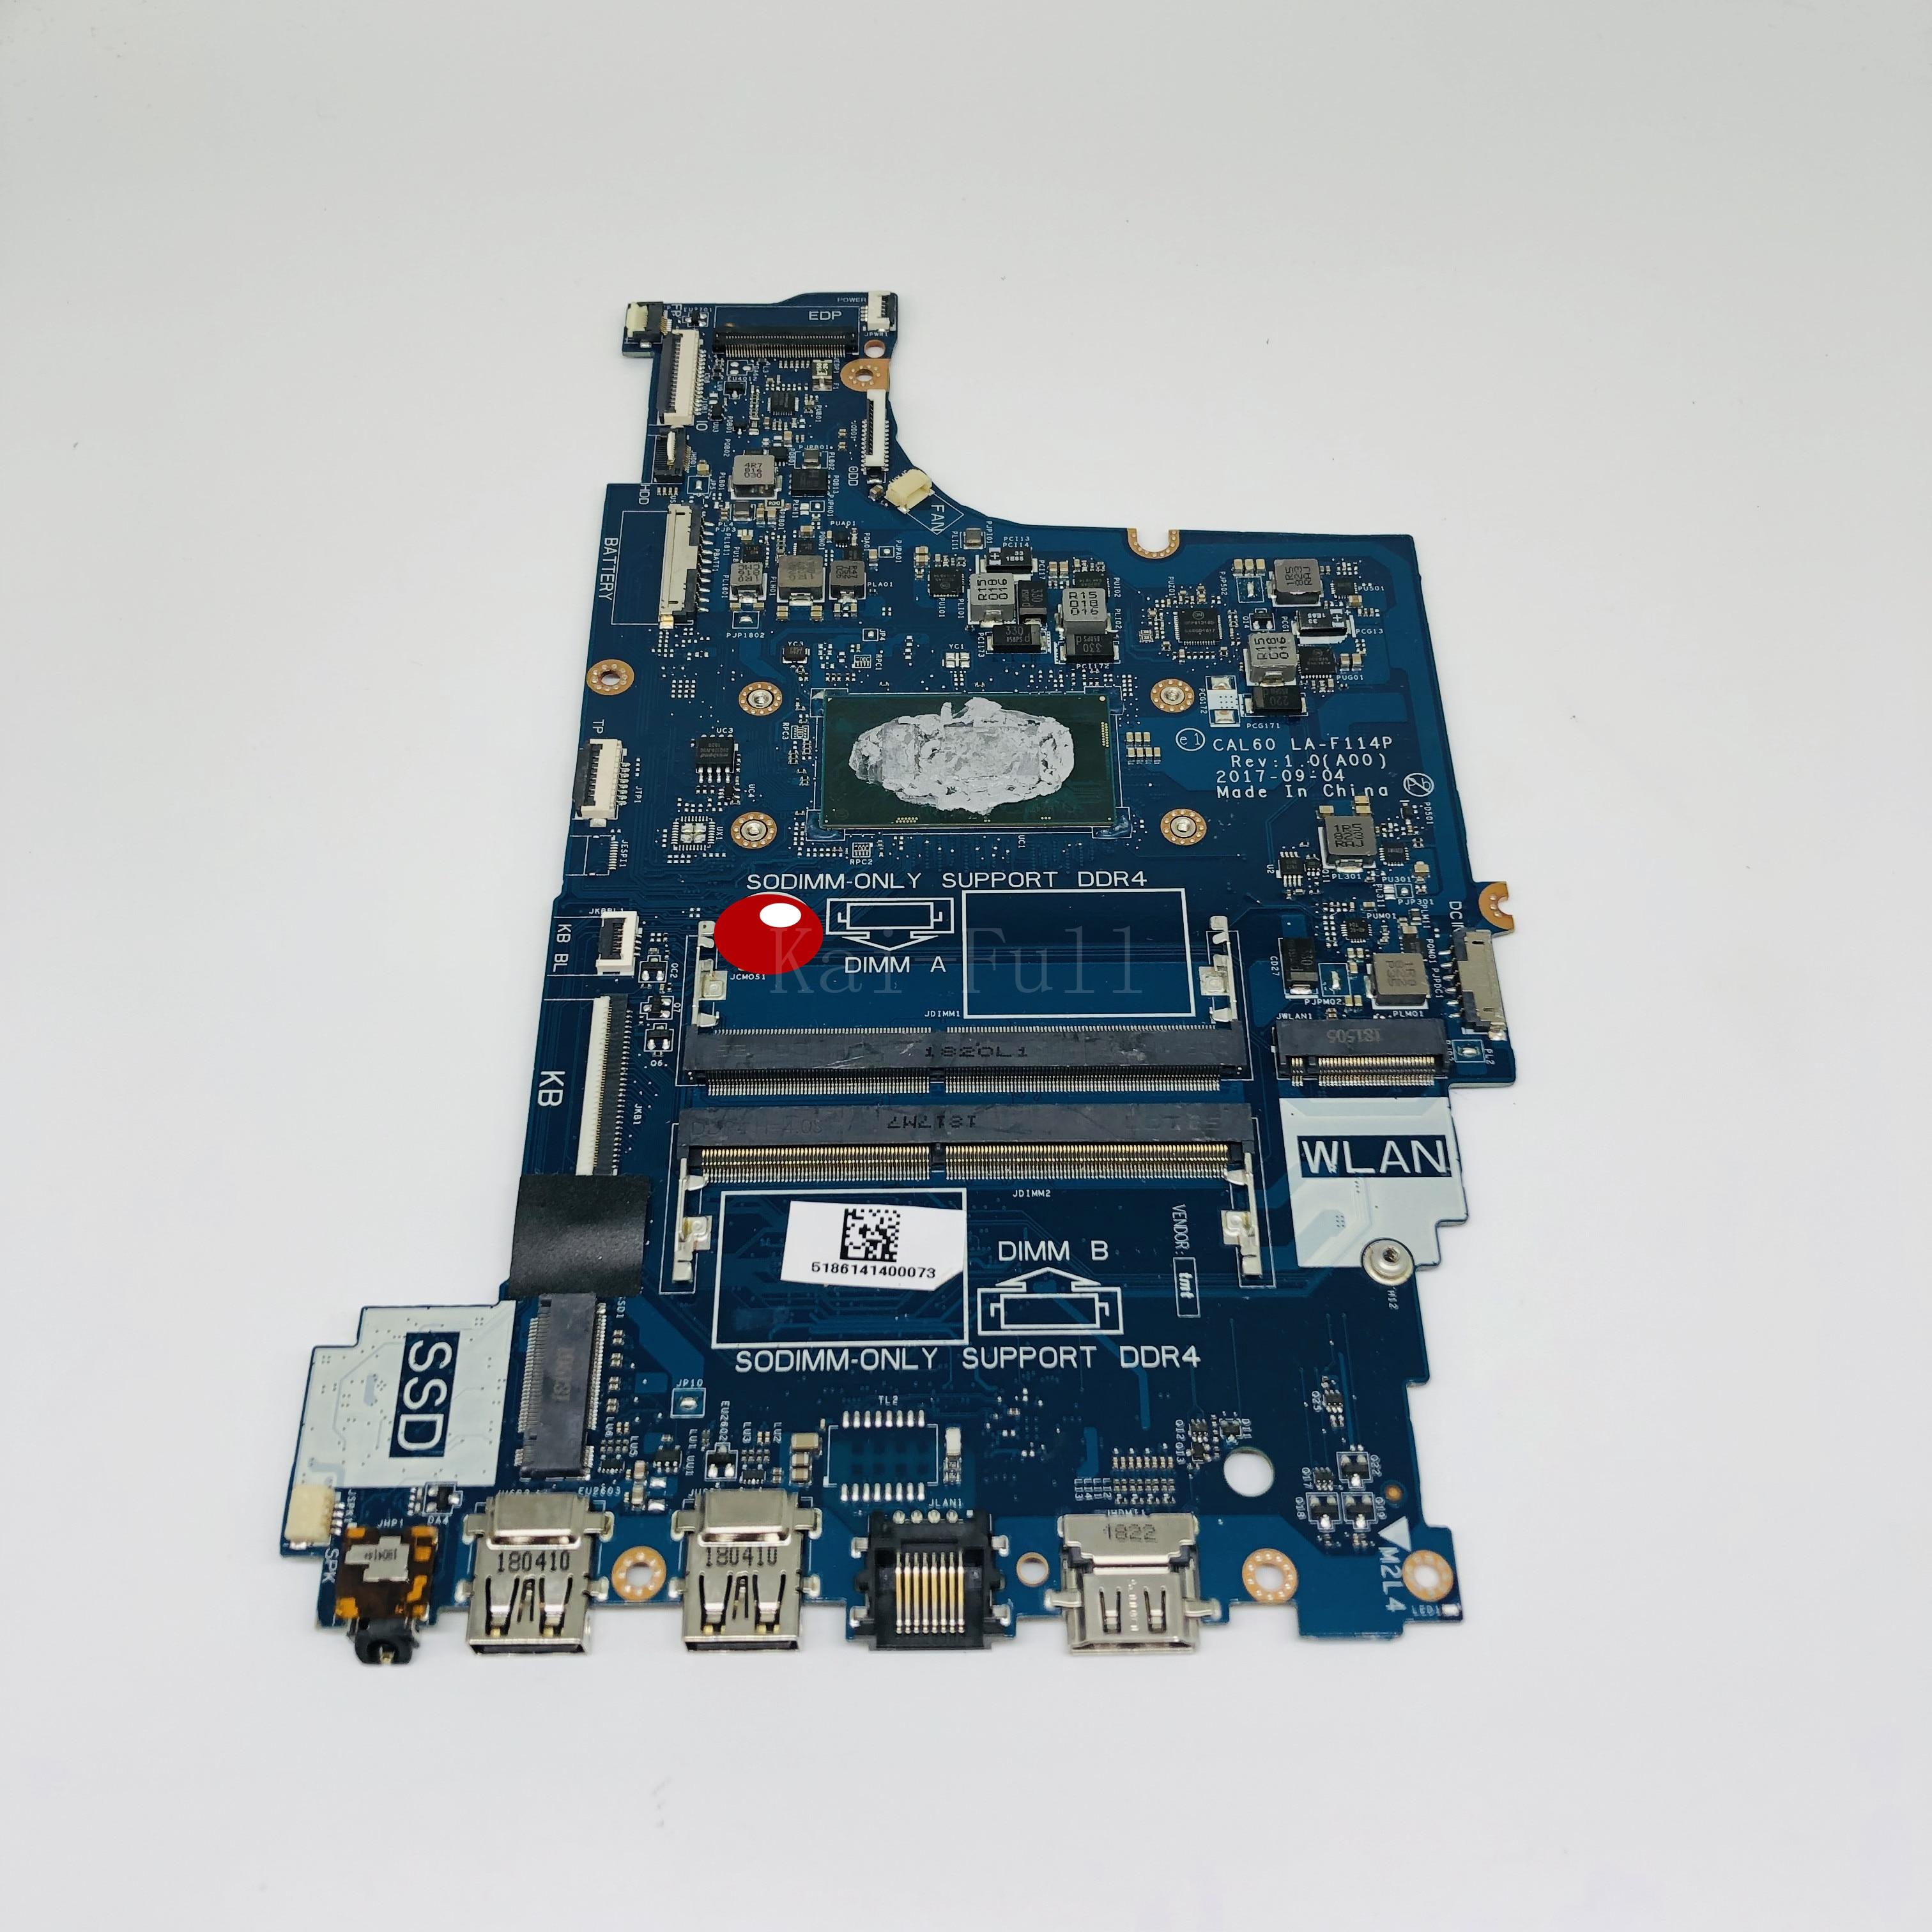 For Dell Inspiron 15 5570 Laptop Motherboard Cn 03k7g5 03k7g5 3k7g5 Cal60 La F114p Ddr4 Mb 100 Tested Fast Ship Laptop Motherboard Aliexpress